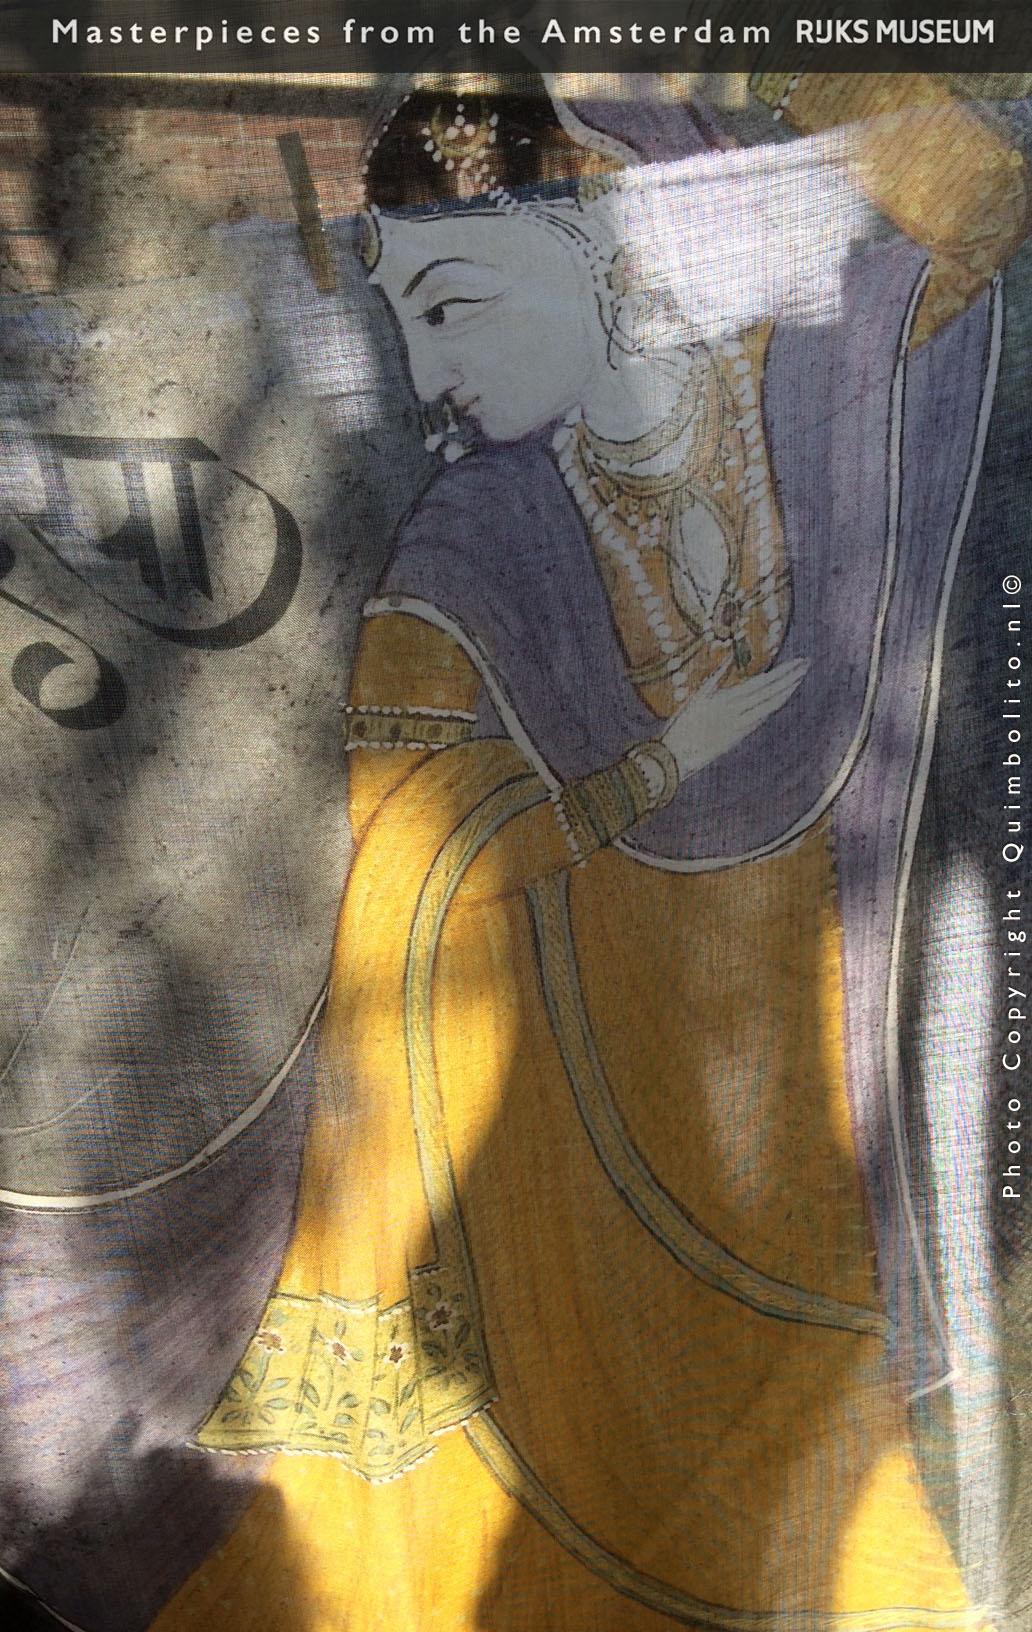 Silk-Woollen scarves with masterpieces of the Rijksmuseum Amsterdam.